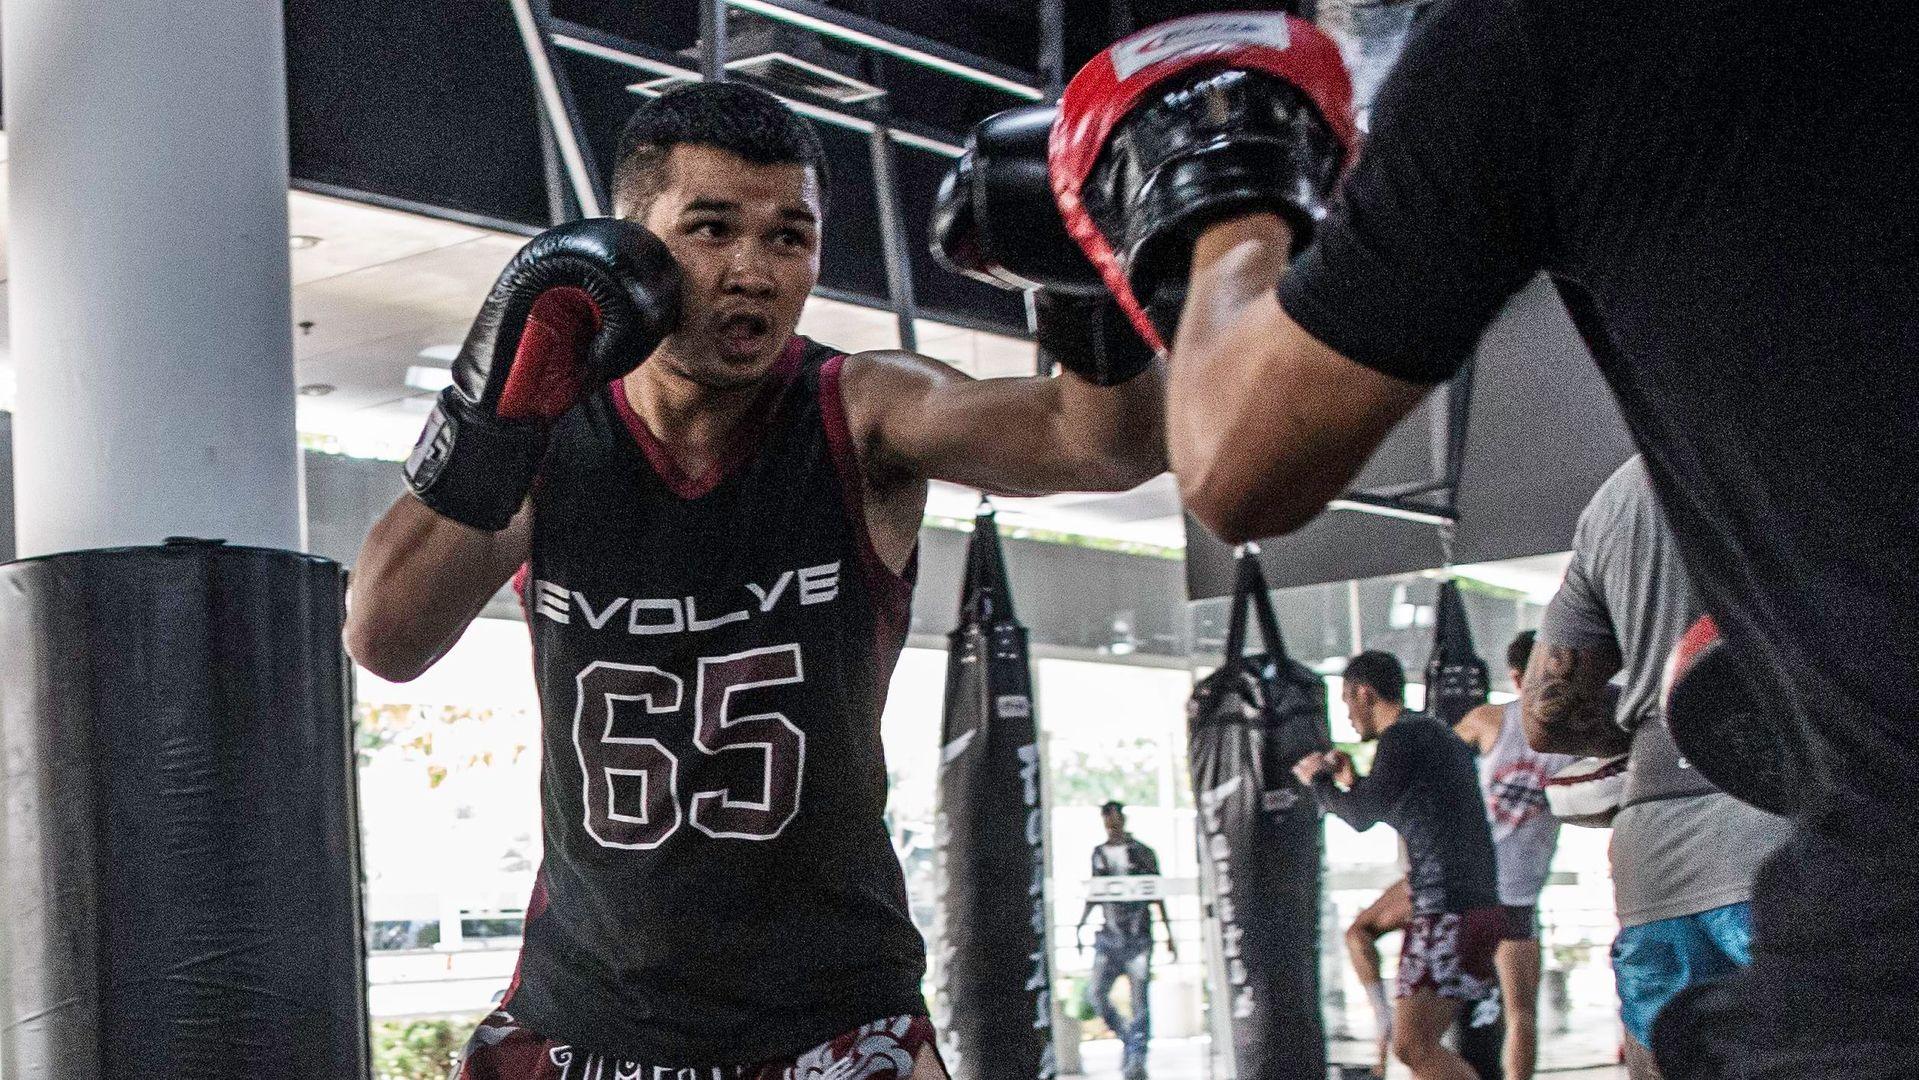 Nong-O Gaiyanghadao training Muay Thai at the Evolve MMA gym